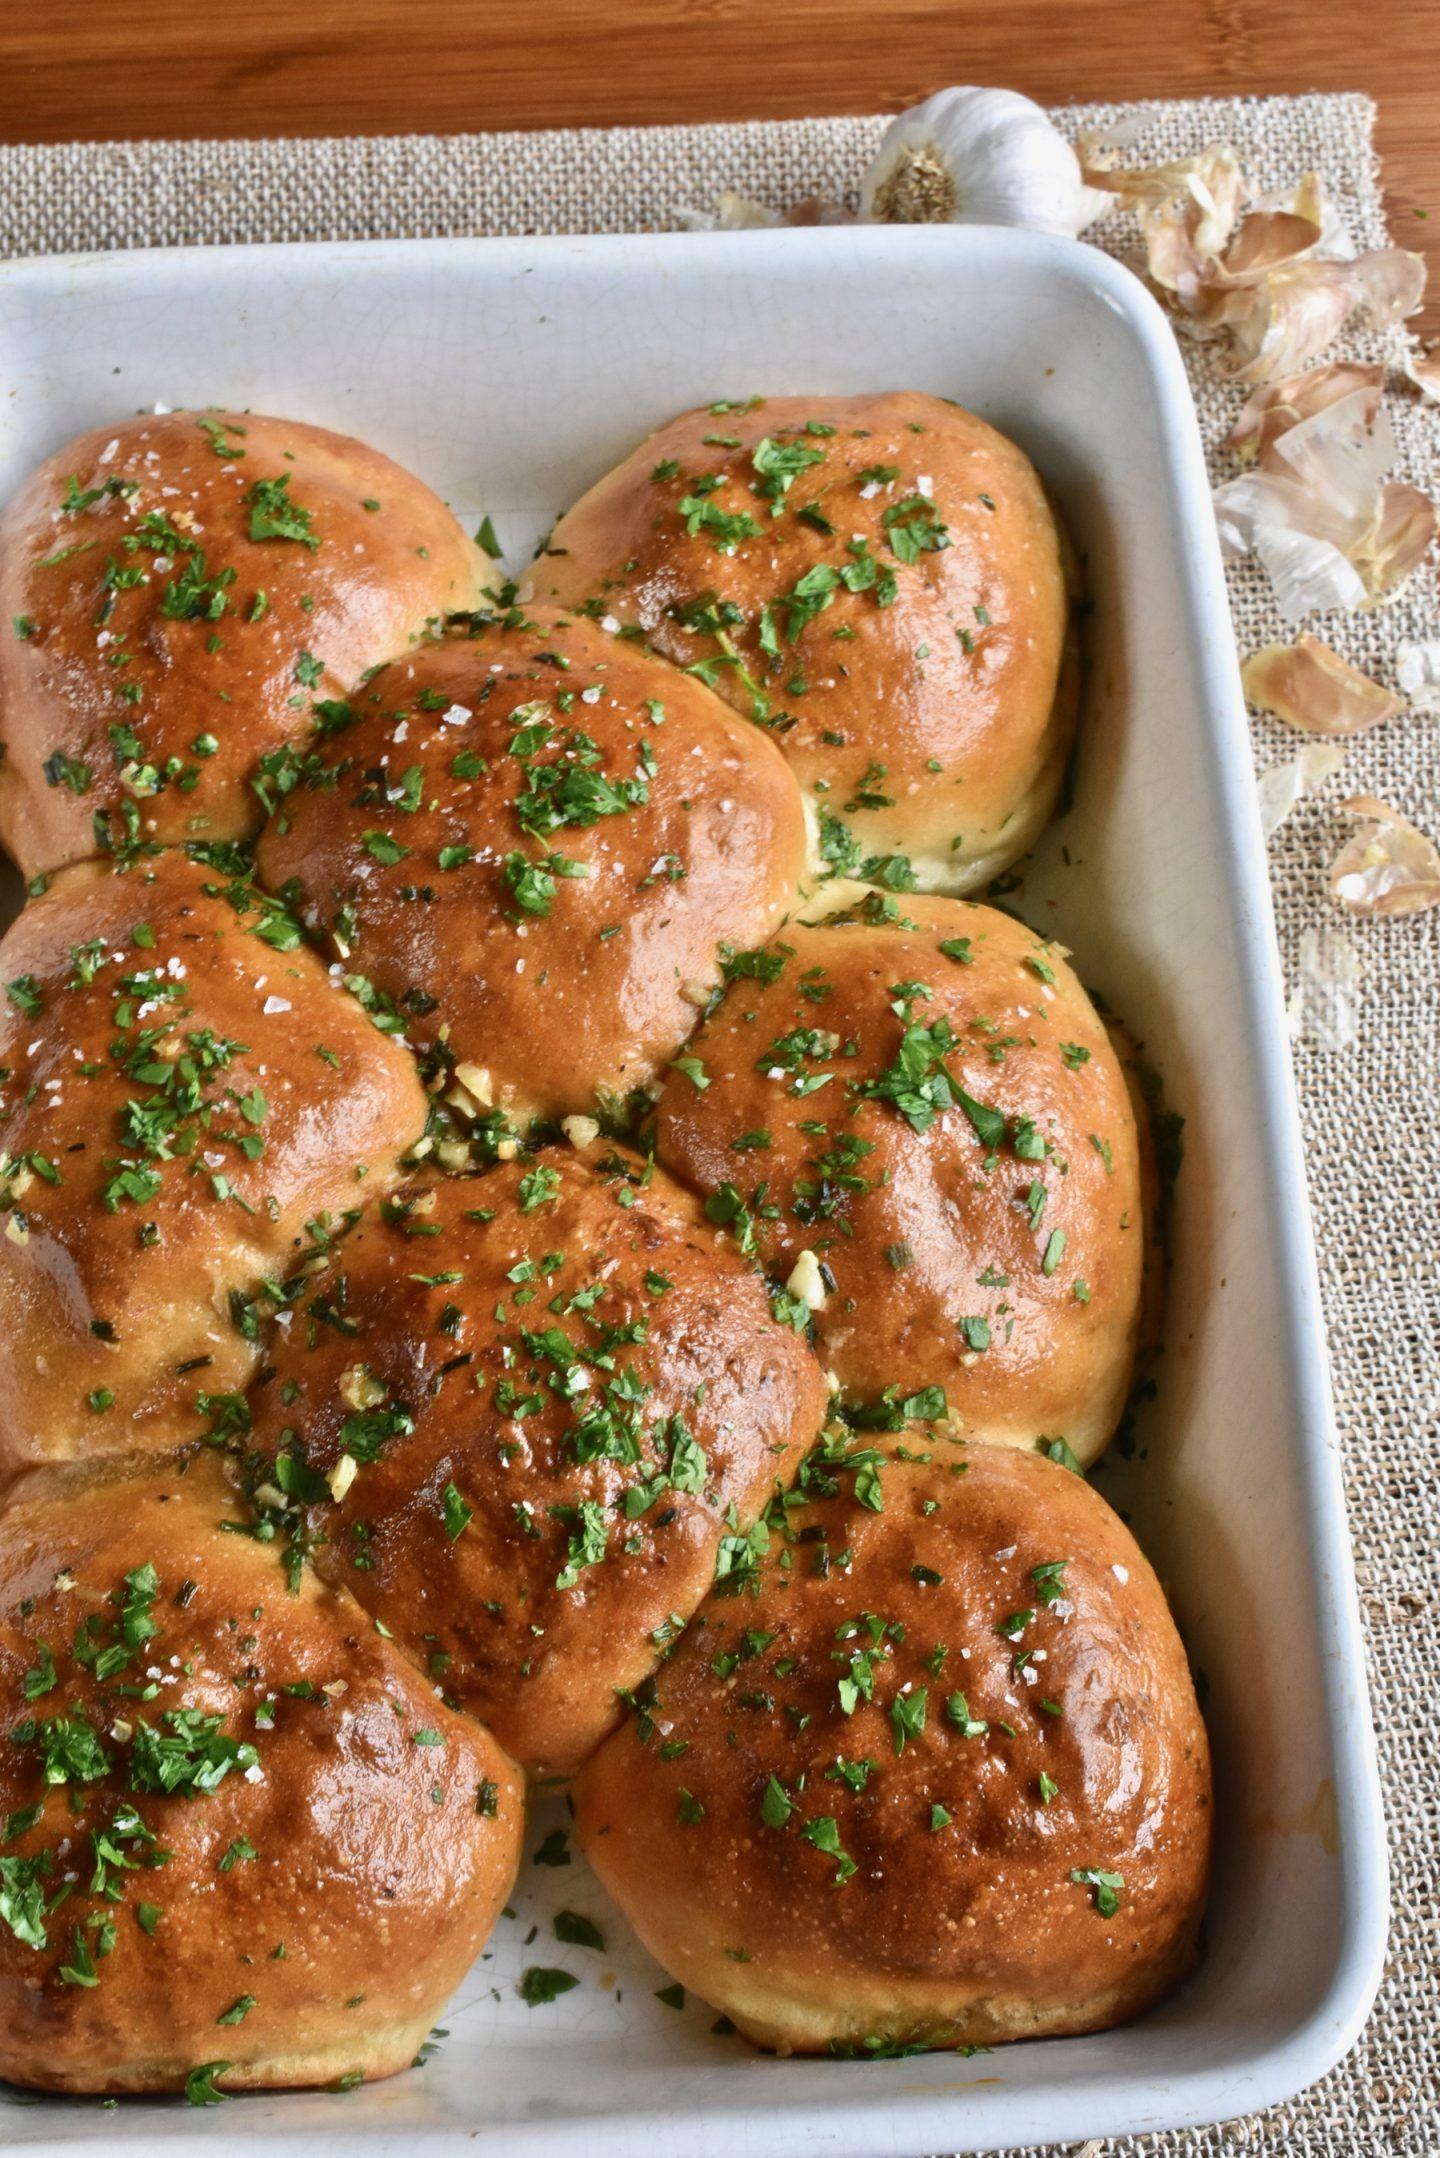 Garlic and Herb Tear 'n' Share Bread Rolls #tearandsharebread